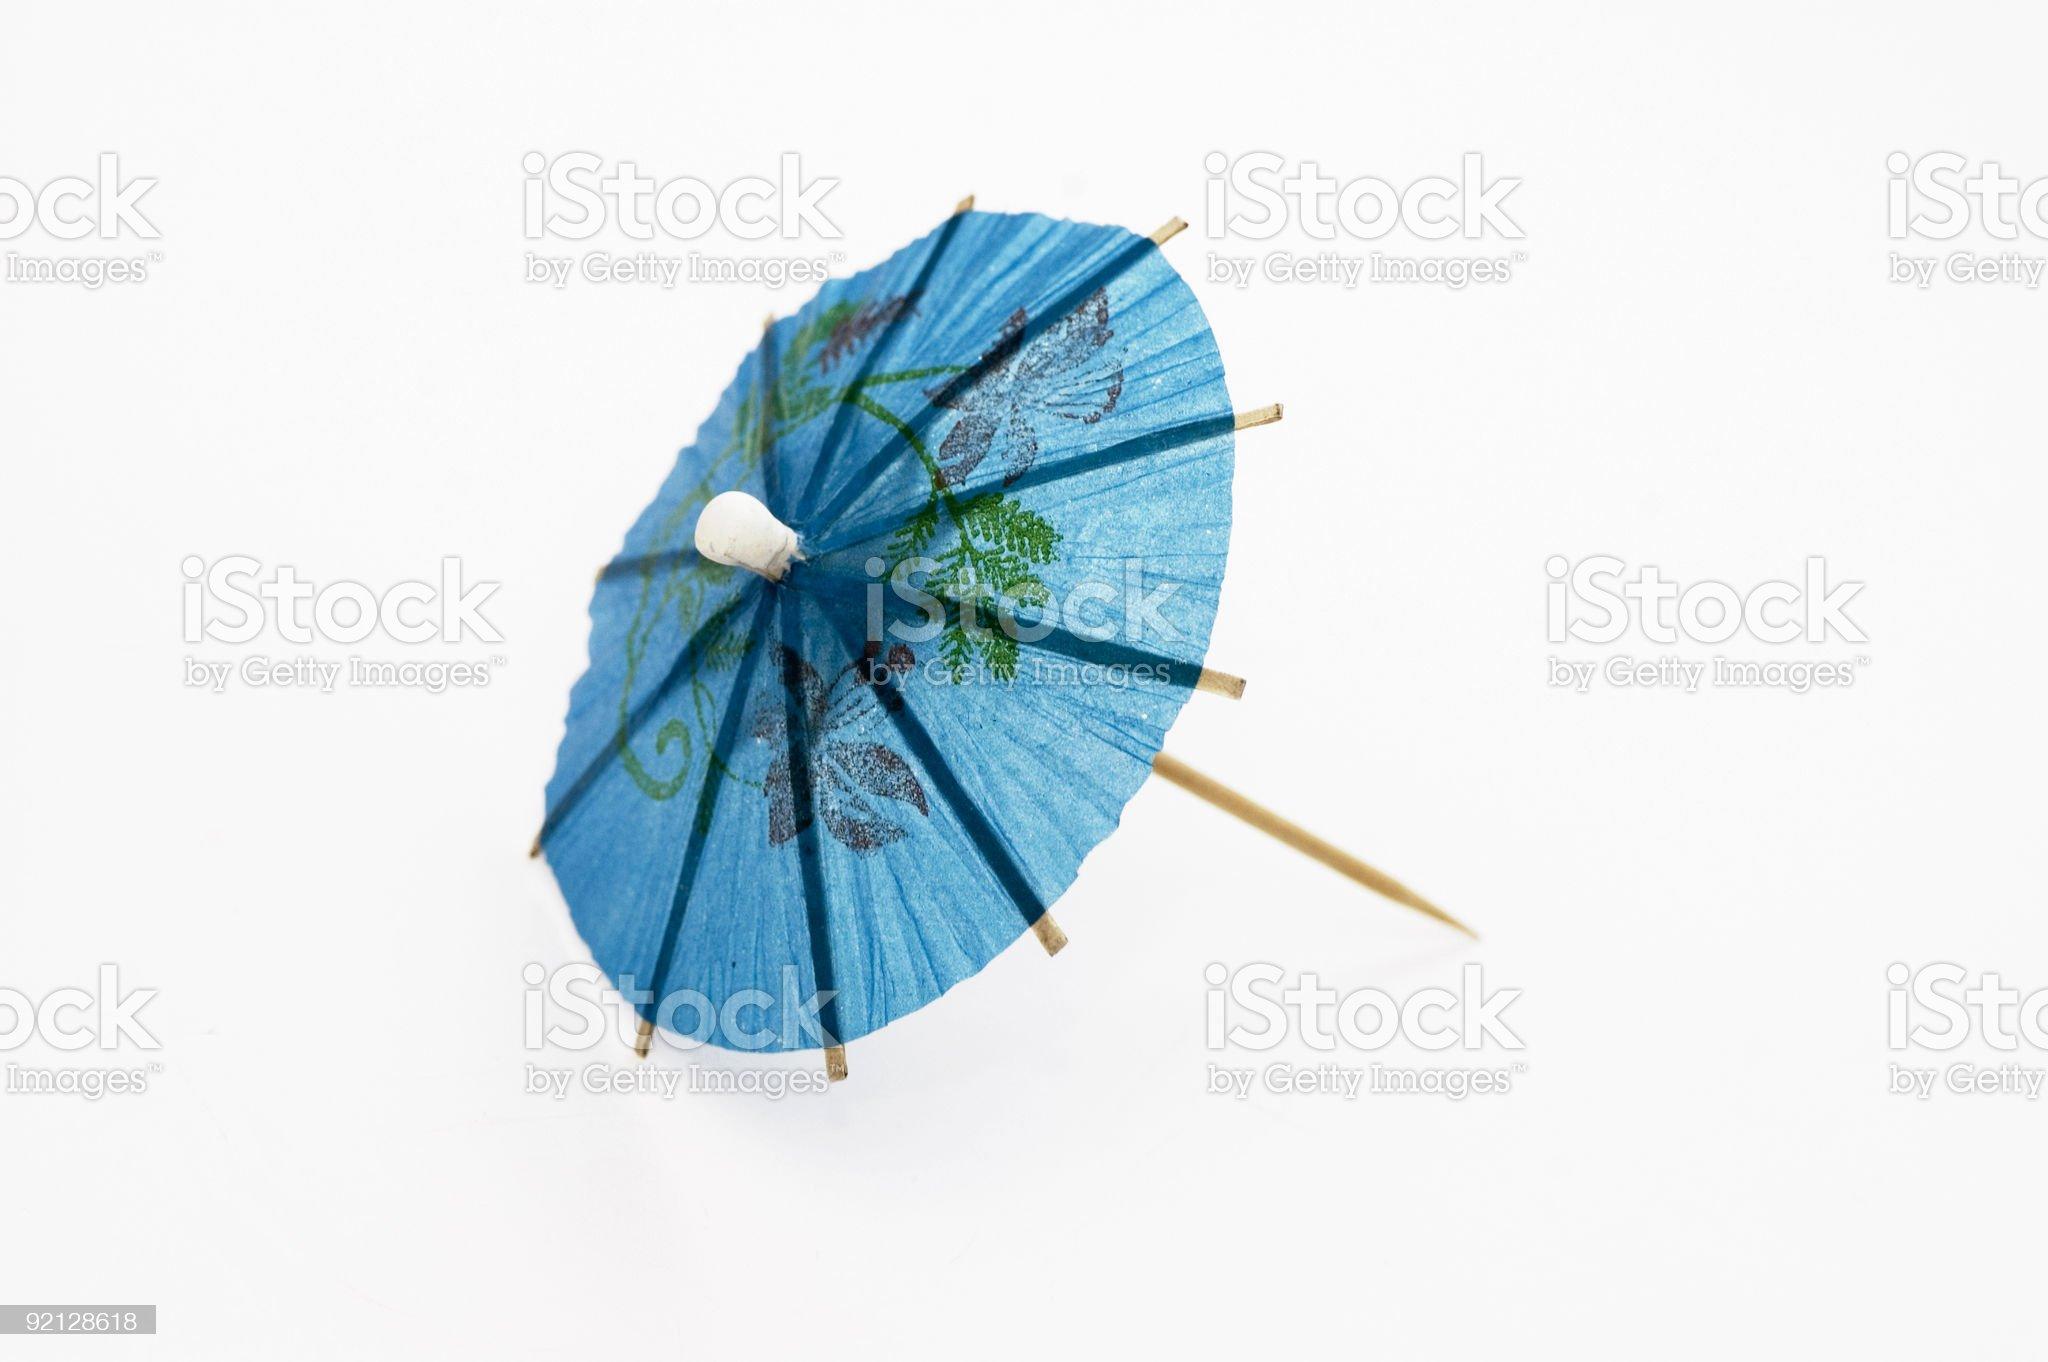 Blue Cocktail Umbrella royalty-free stock photo